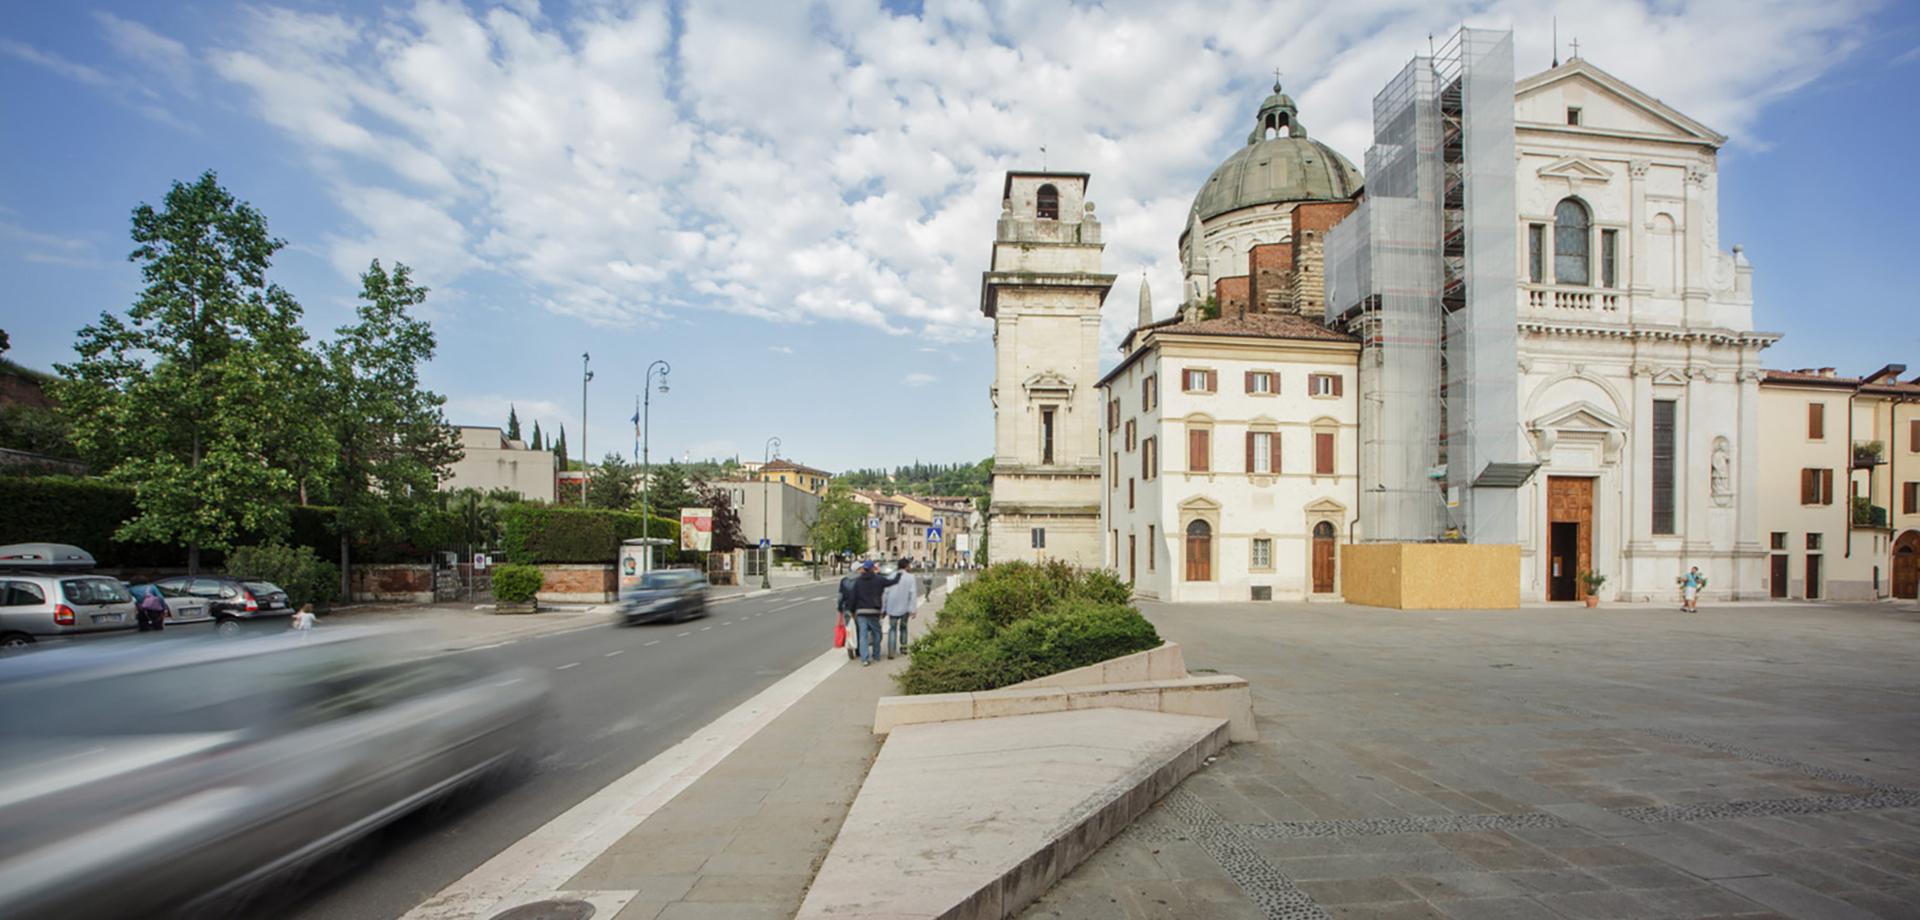 PIAZZETTA SAN GIORGIO IN BRAIDA Verona